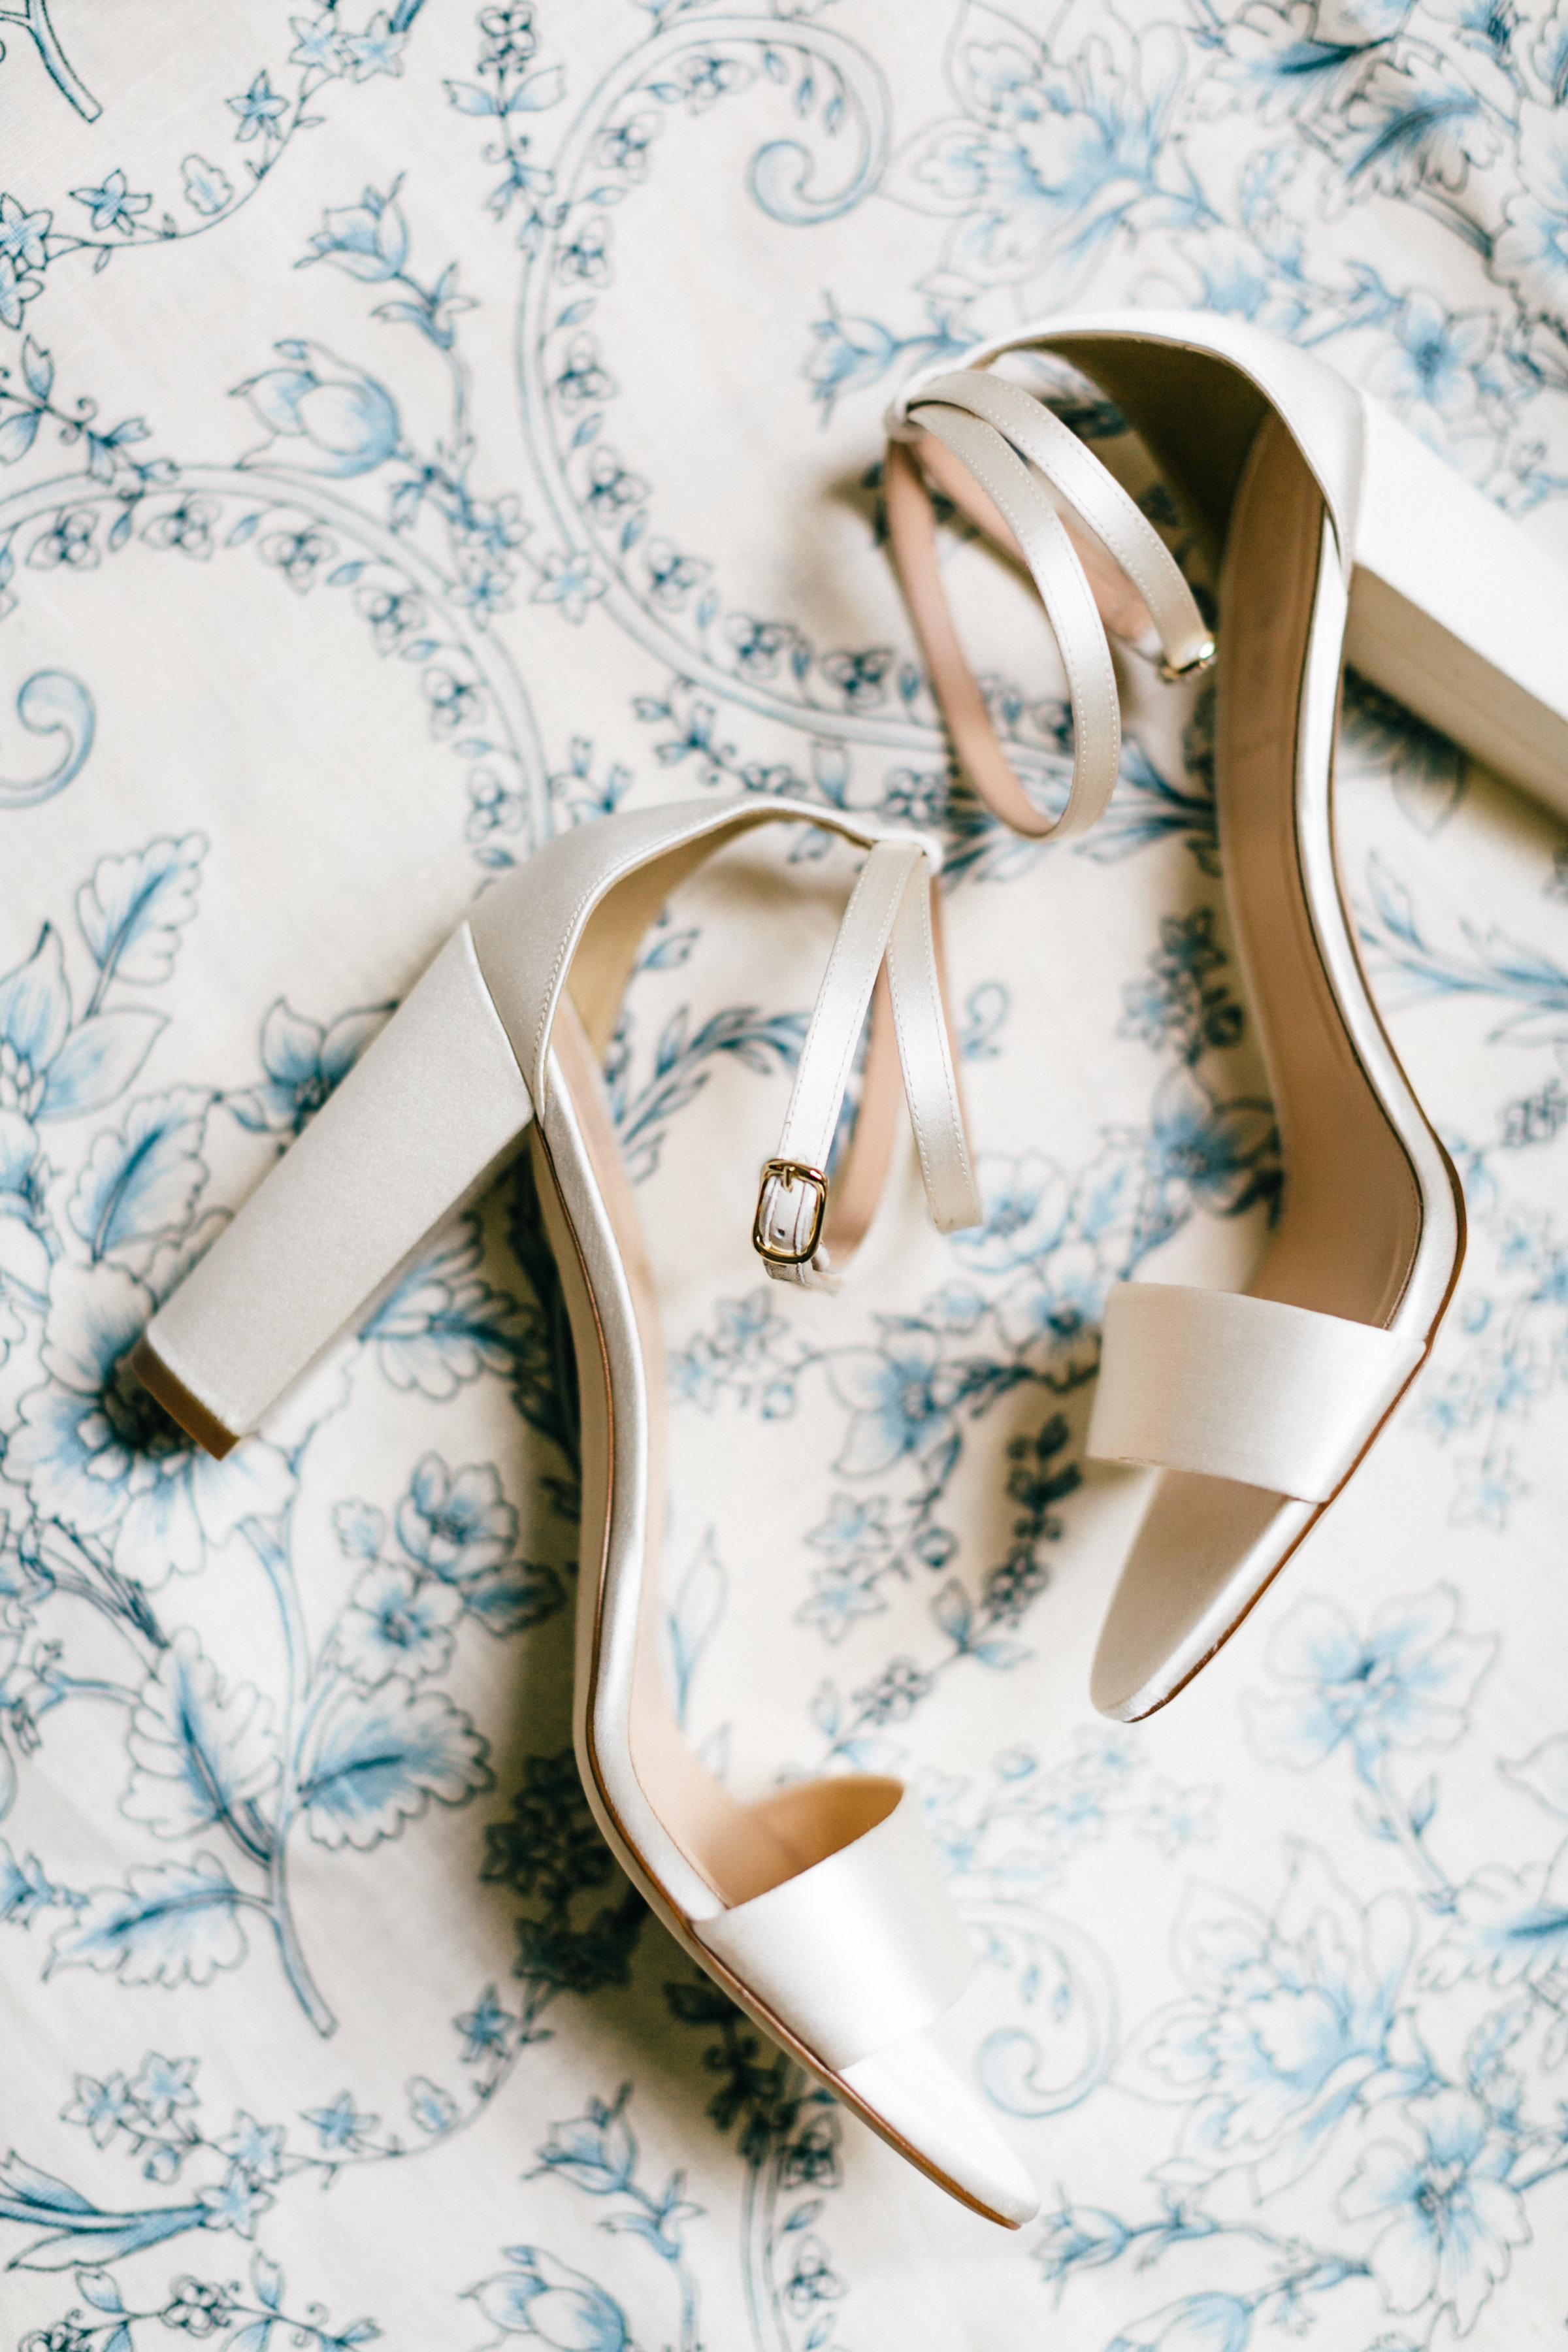 doloughty-wedding-11.jpg